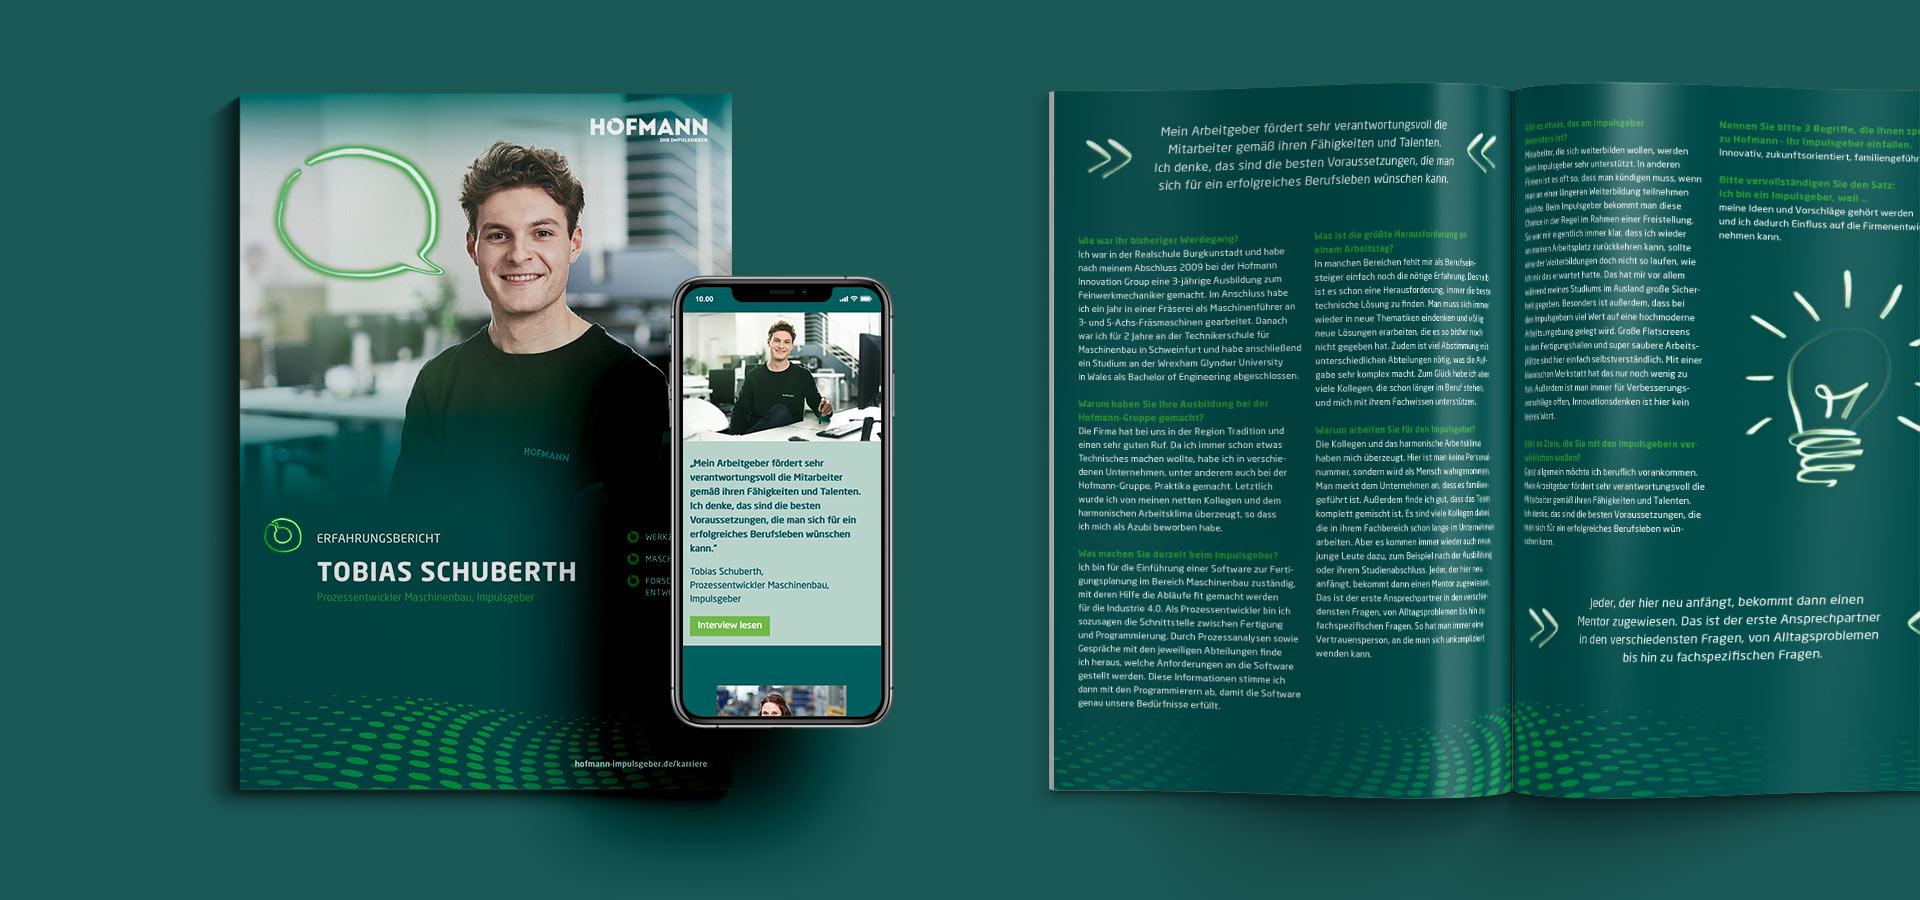 OPUS Marketing / Projekt / Hofmann Impulsgeber / Erfahrungsberichte